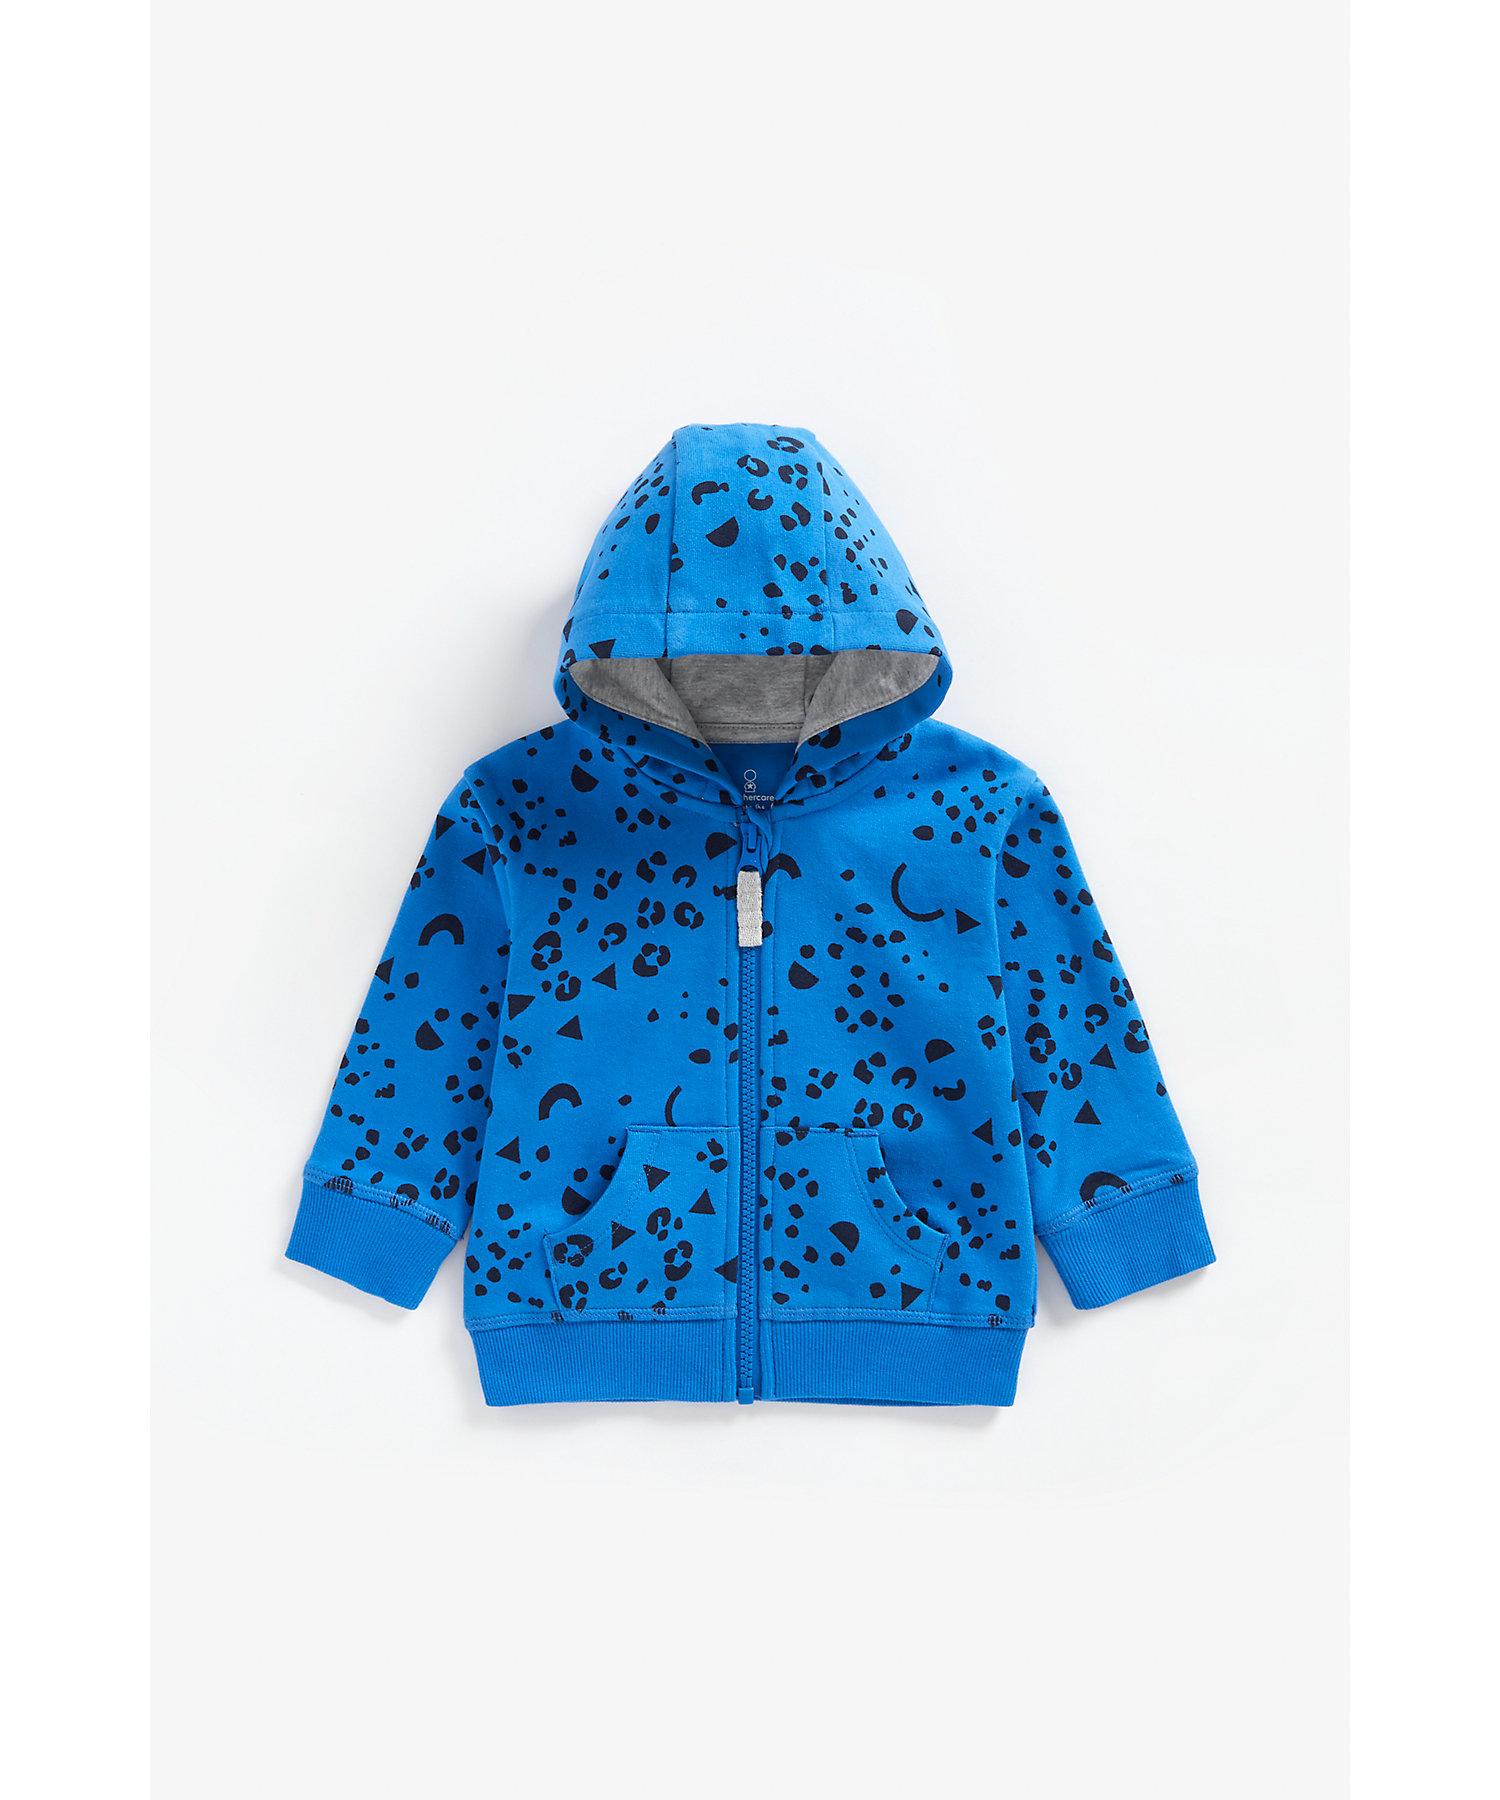 Mothercare | Boys Full Sleeves Hooded Sweatshirt Leopard Print - Blue